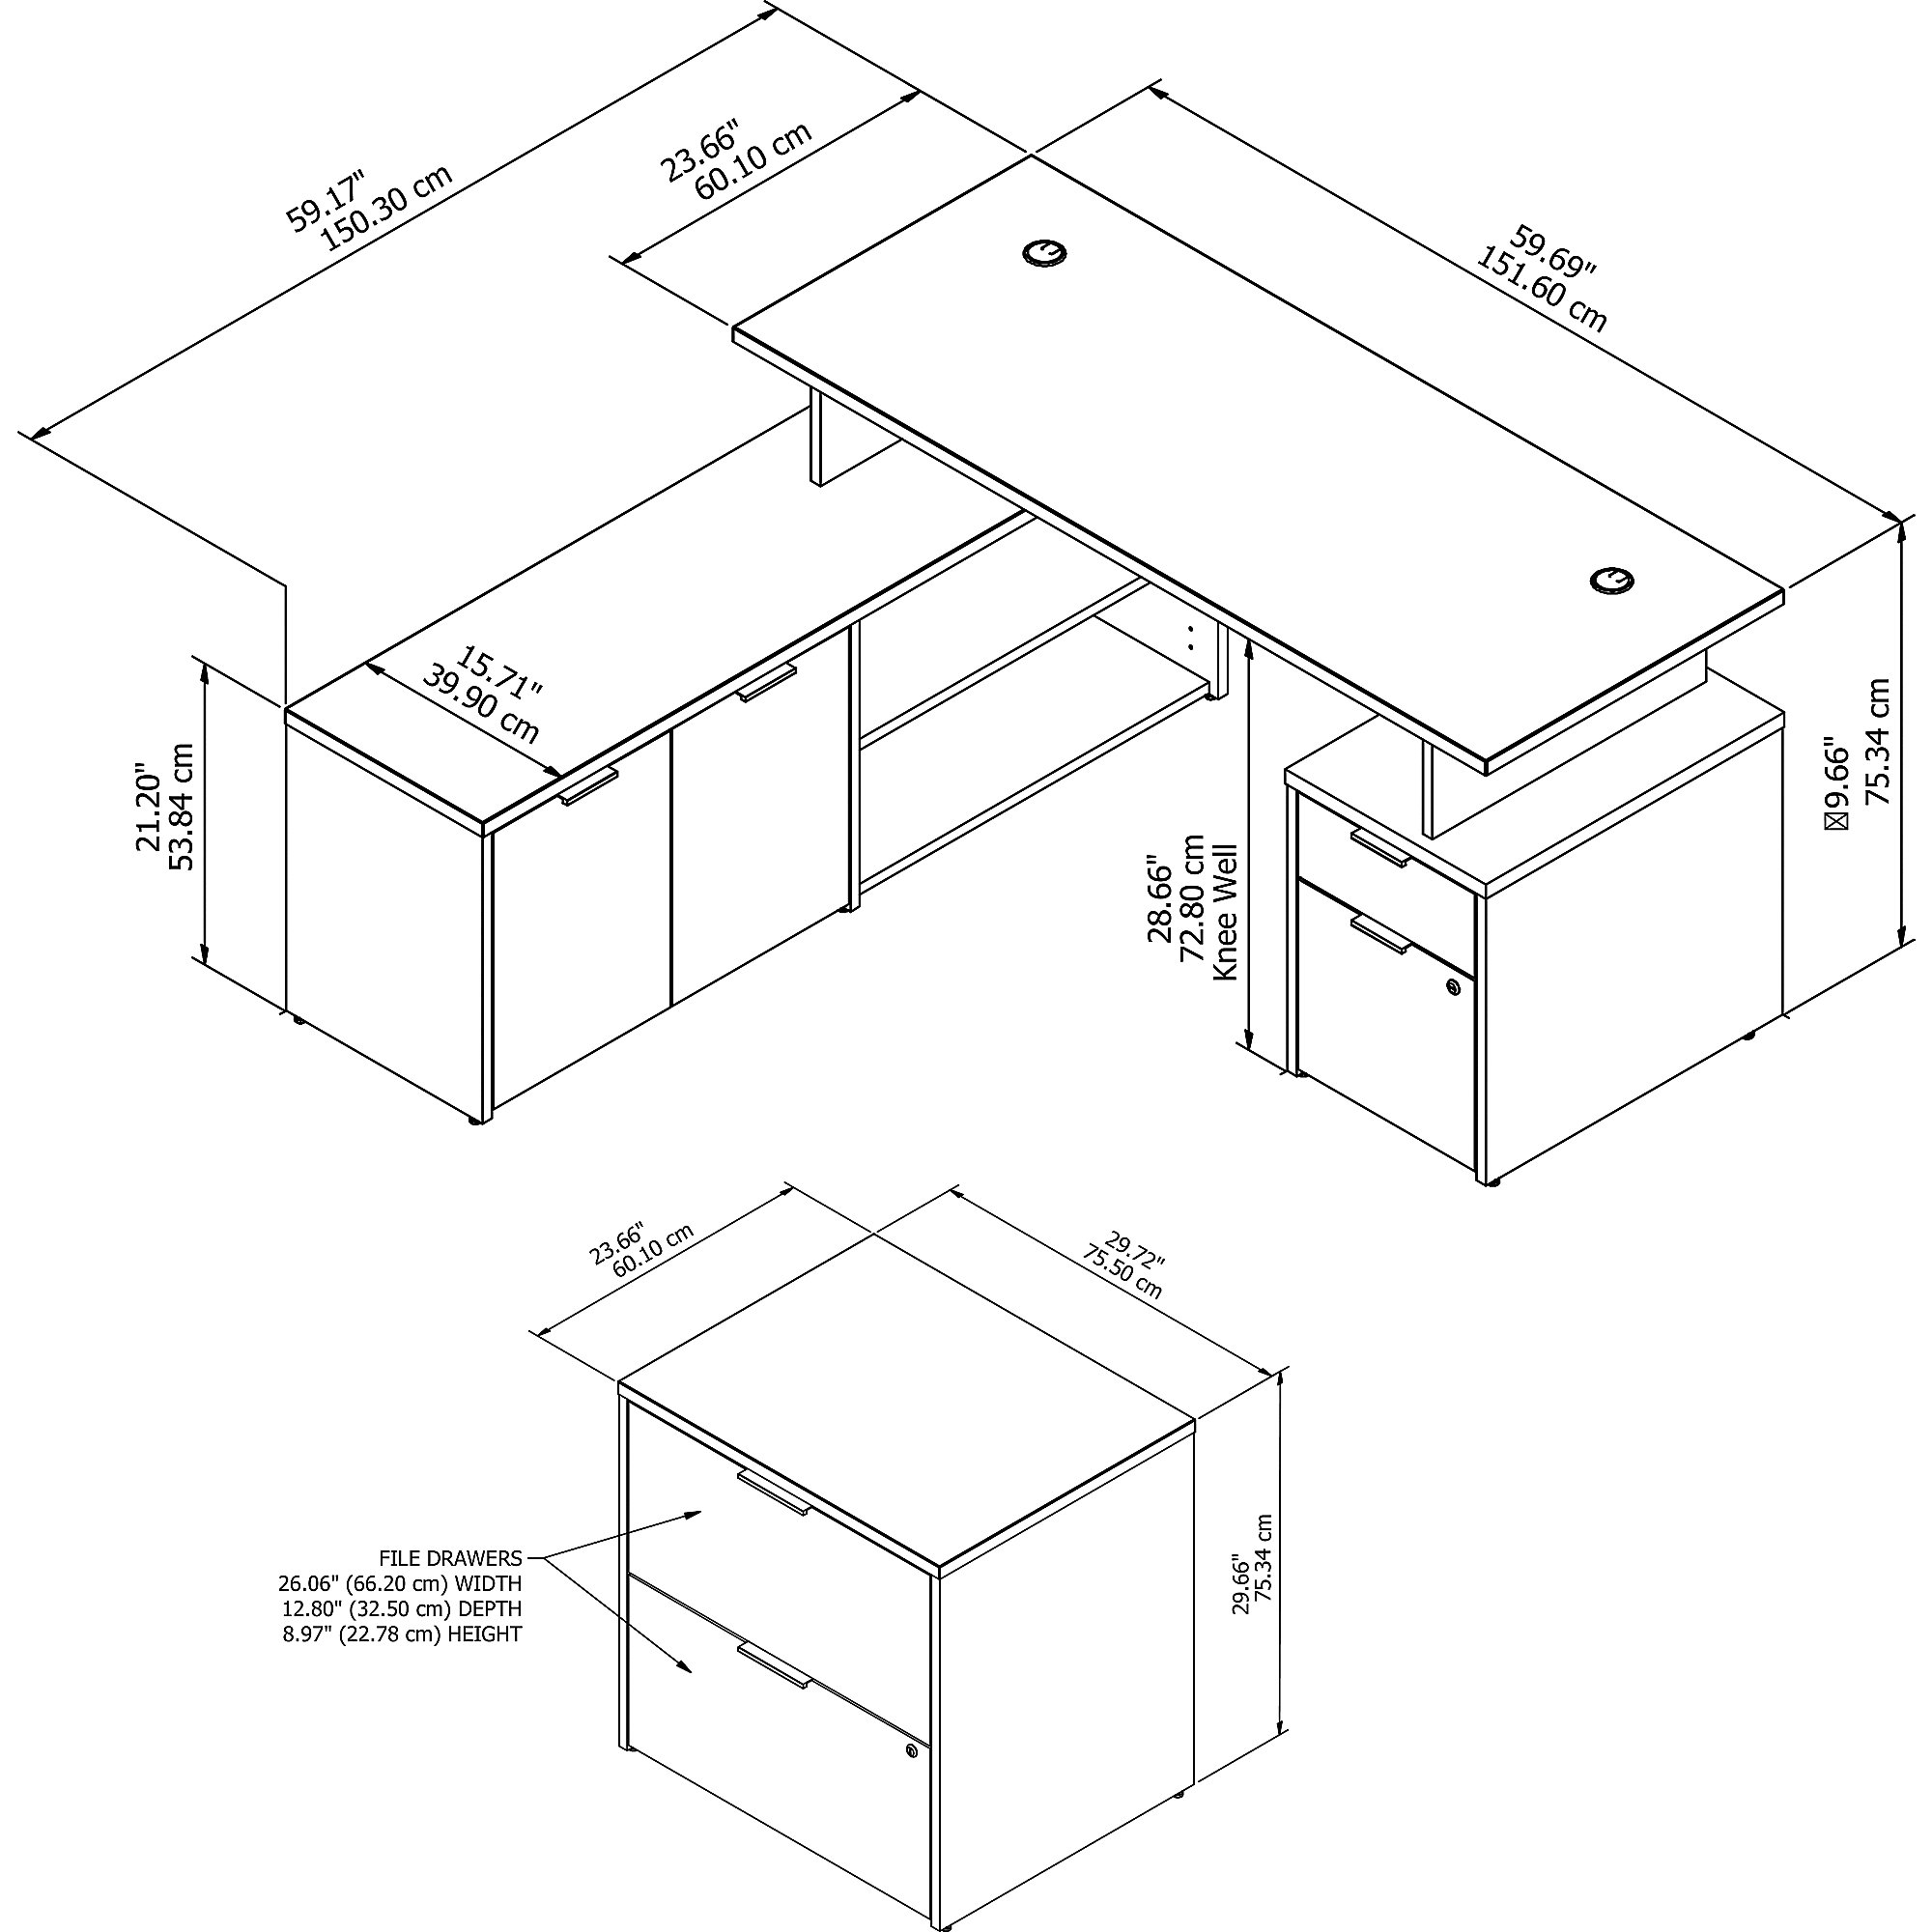 jtn022 desk component dimensions